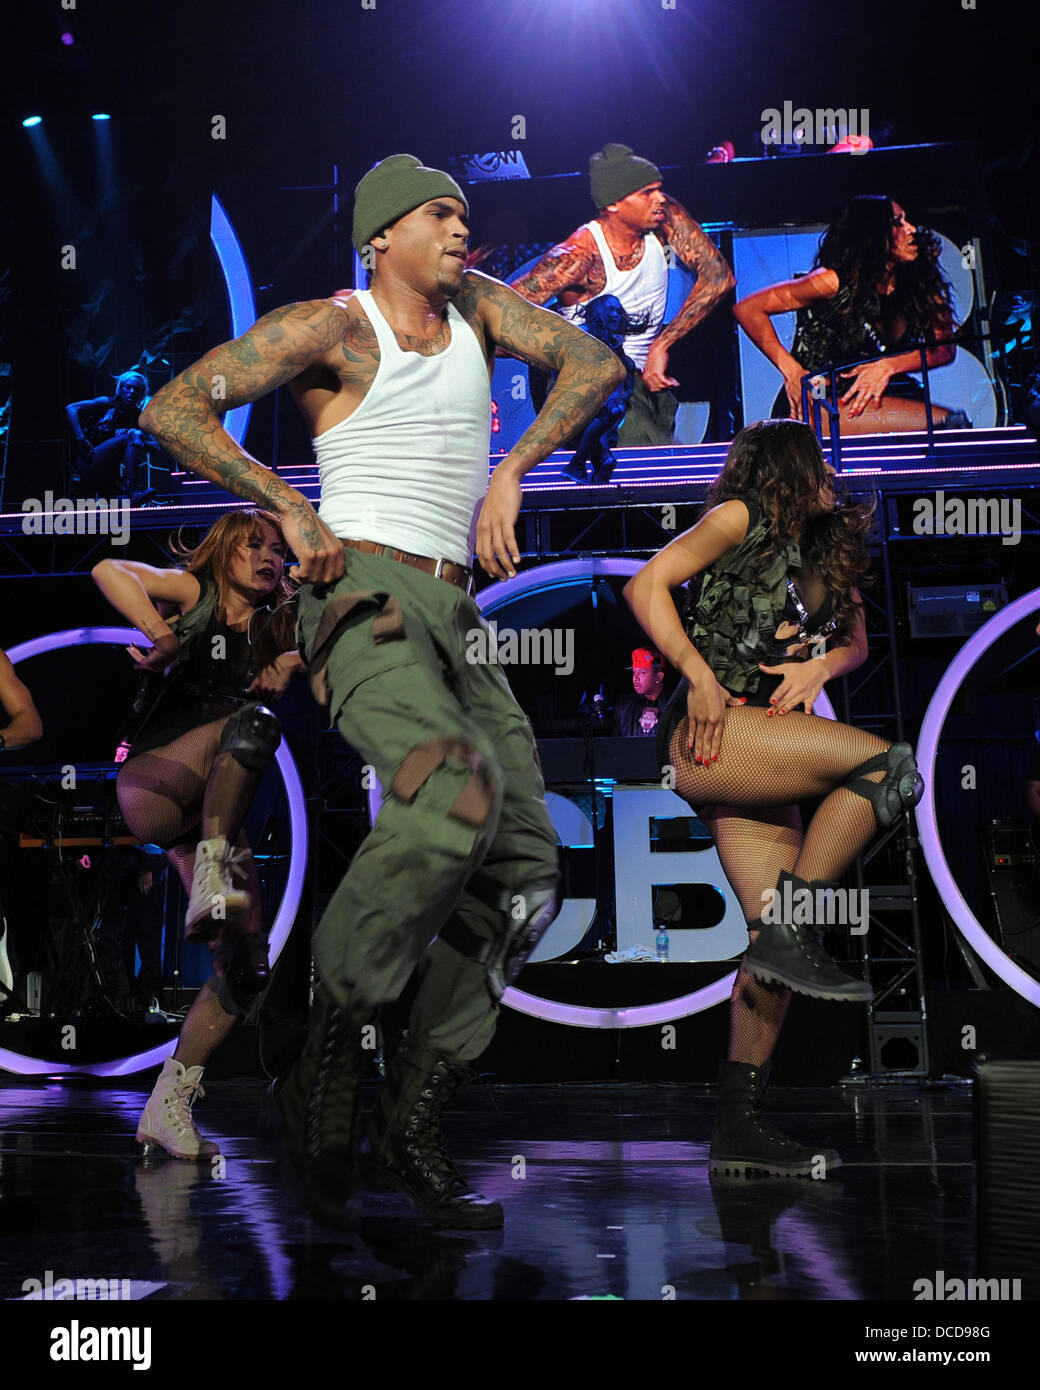 Chris Brown F a m e  Stock Photos & Chris Brown F a m e